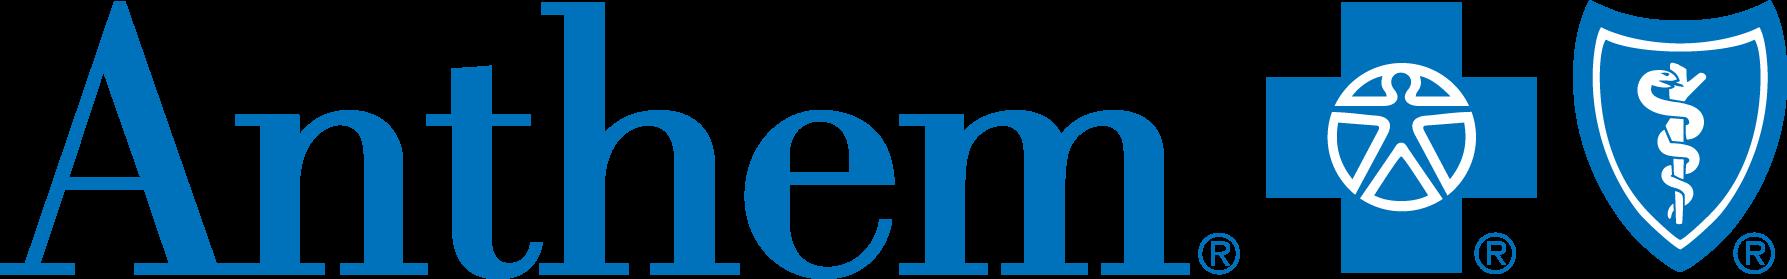 anthem updated logo - Ronald McDonald House Charities of Maine